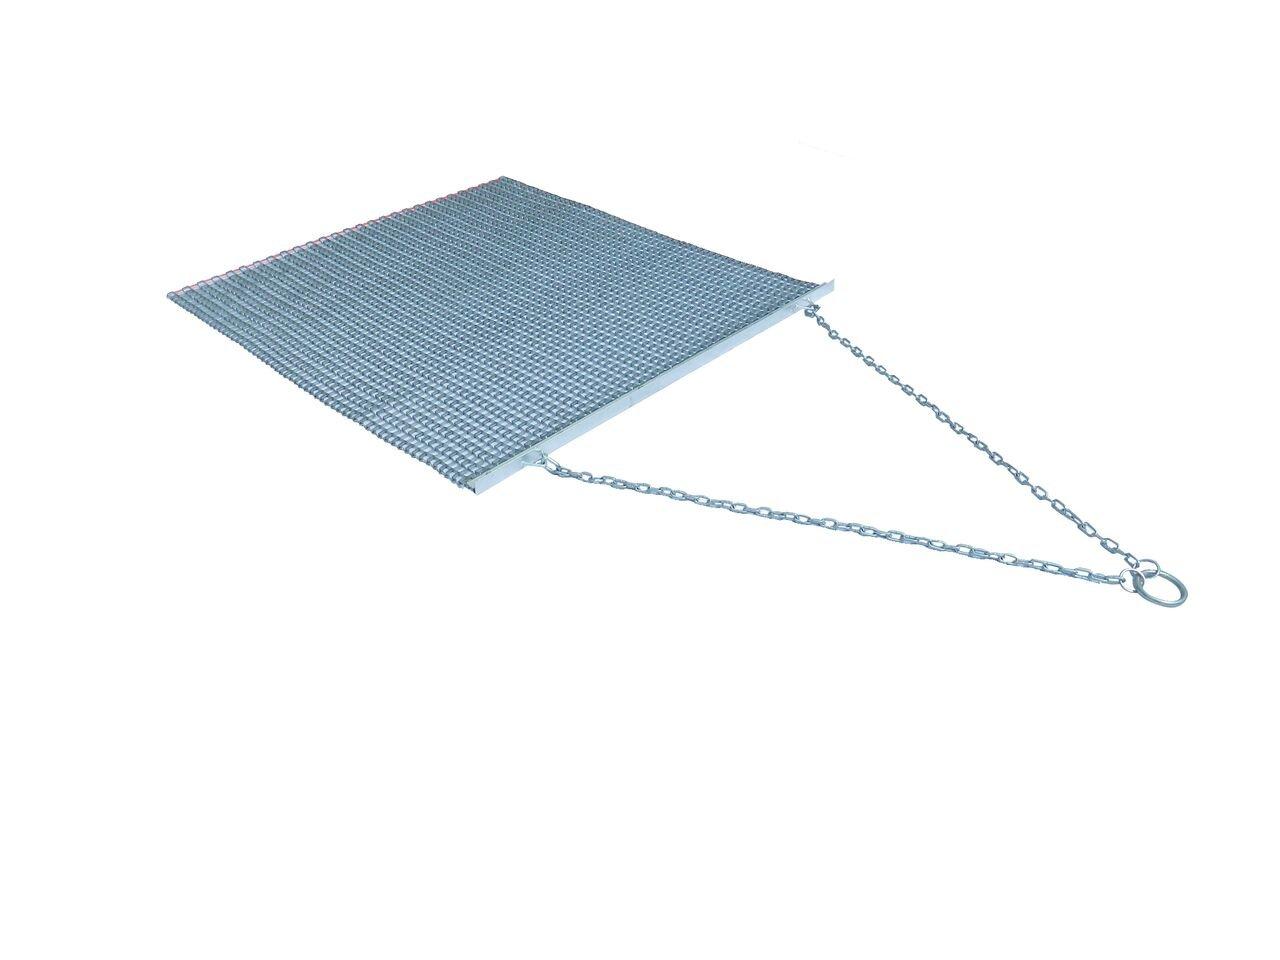 amazon com drag mats field equipment sports u0026 outdoors